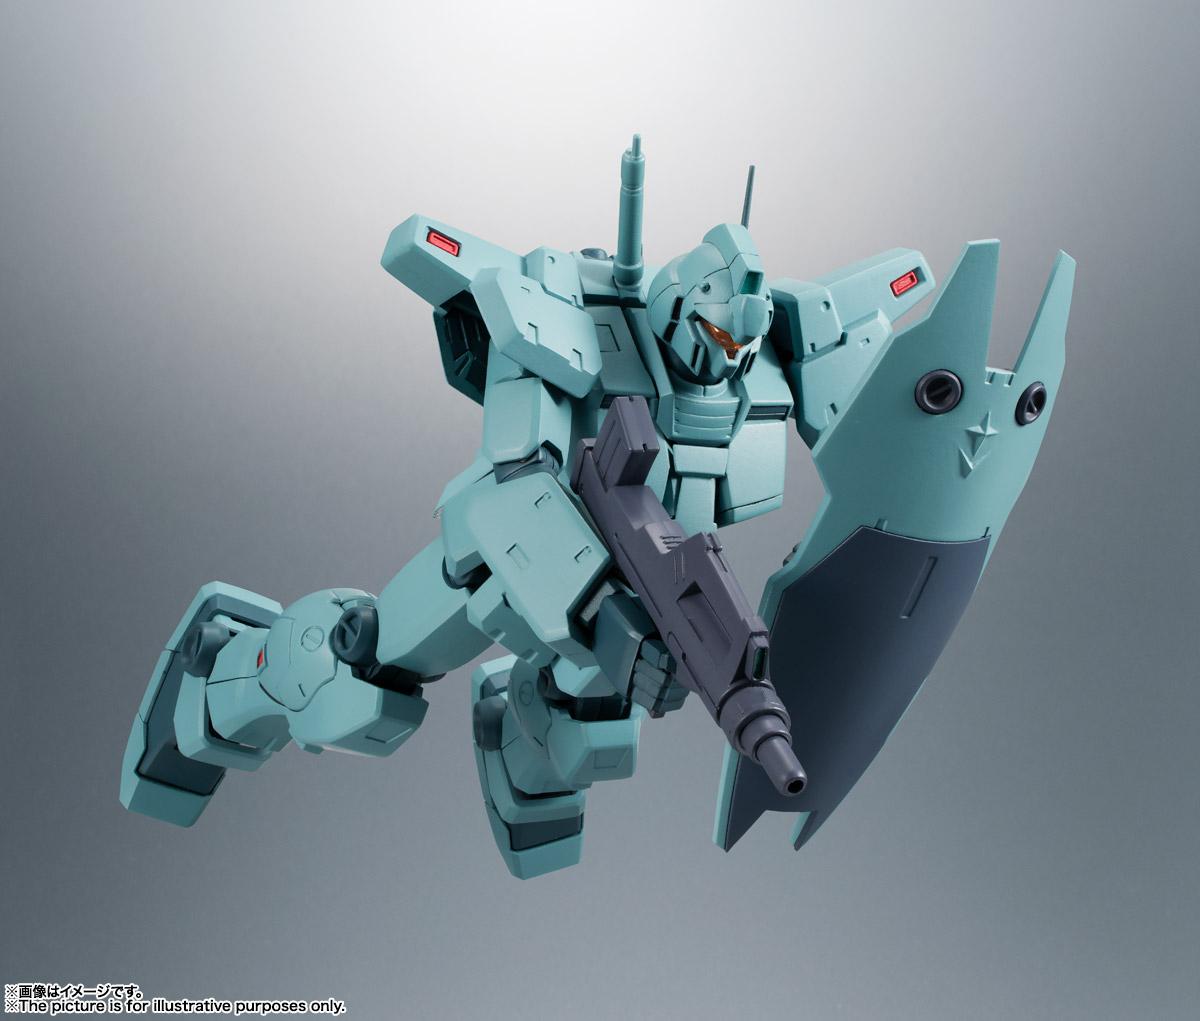 ROBOT魂〈SIDE MS〉『RGM-79N ジム・カスタム ver. A.N.I.M.E.』ガンダム0083 可動フィギュア-007